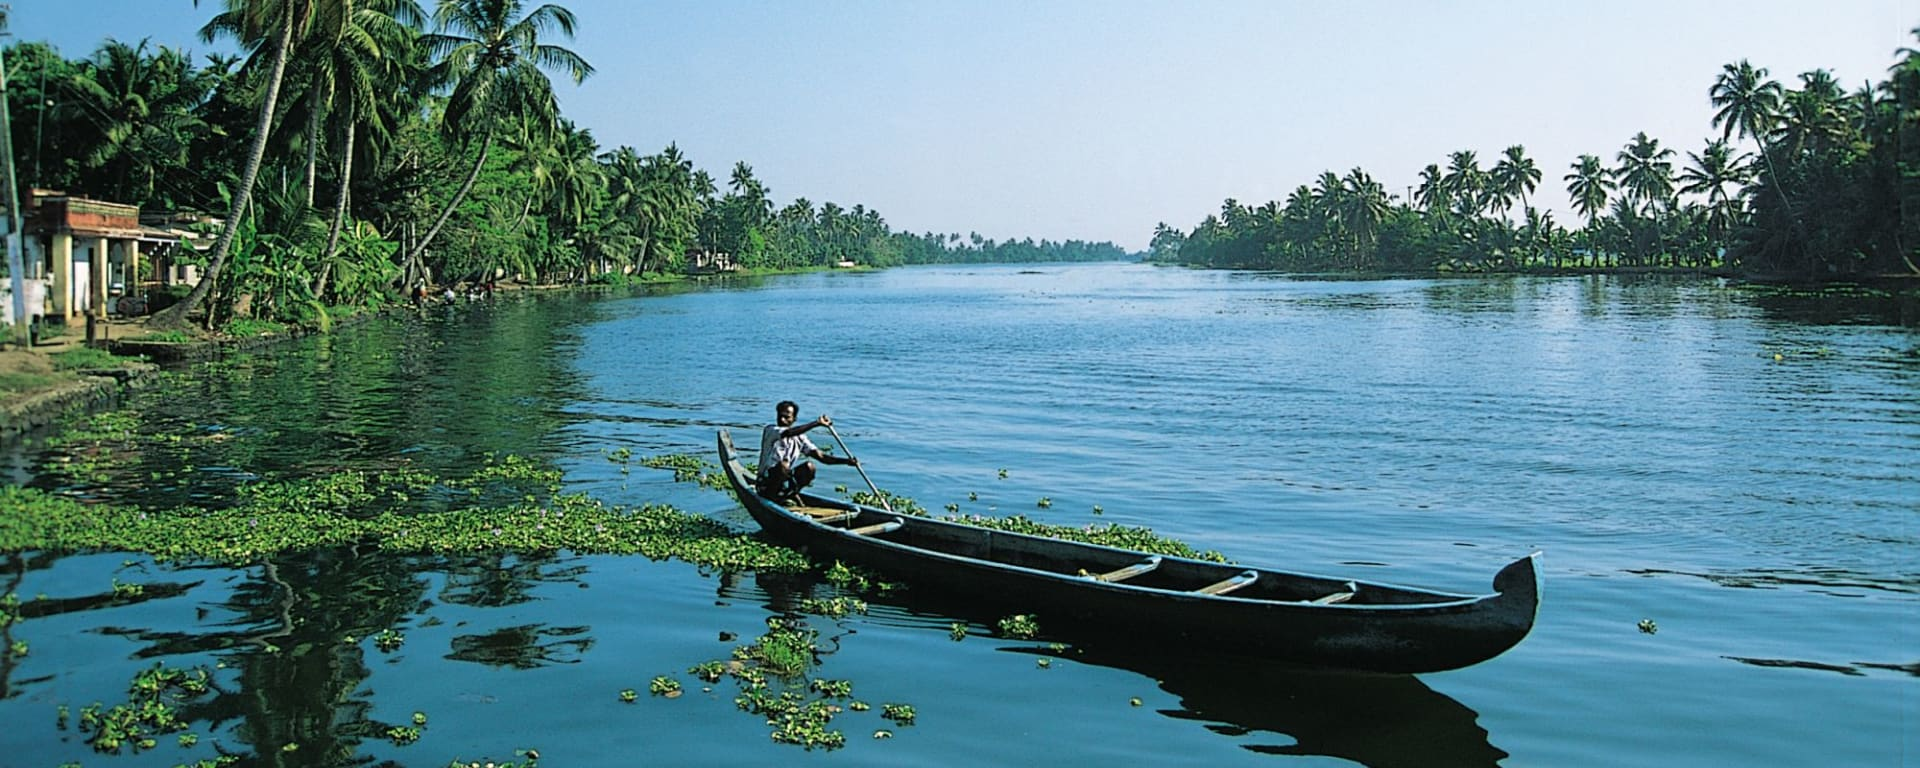 Backwaters von Kerala ab Kochi: Backwaters: local boat